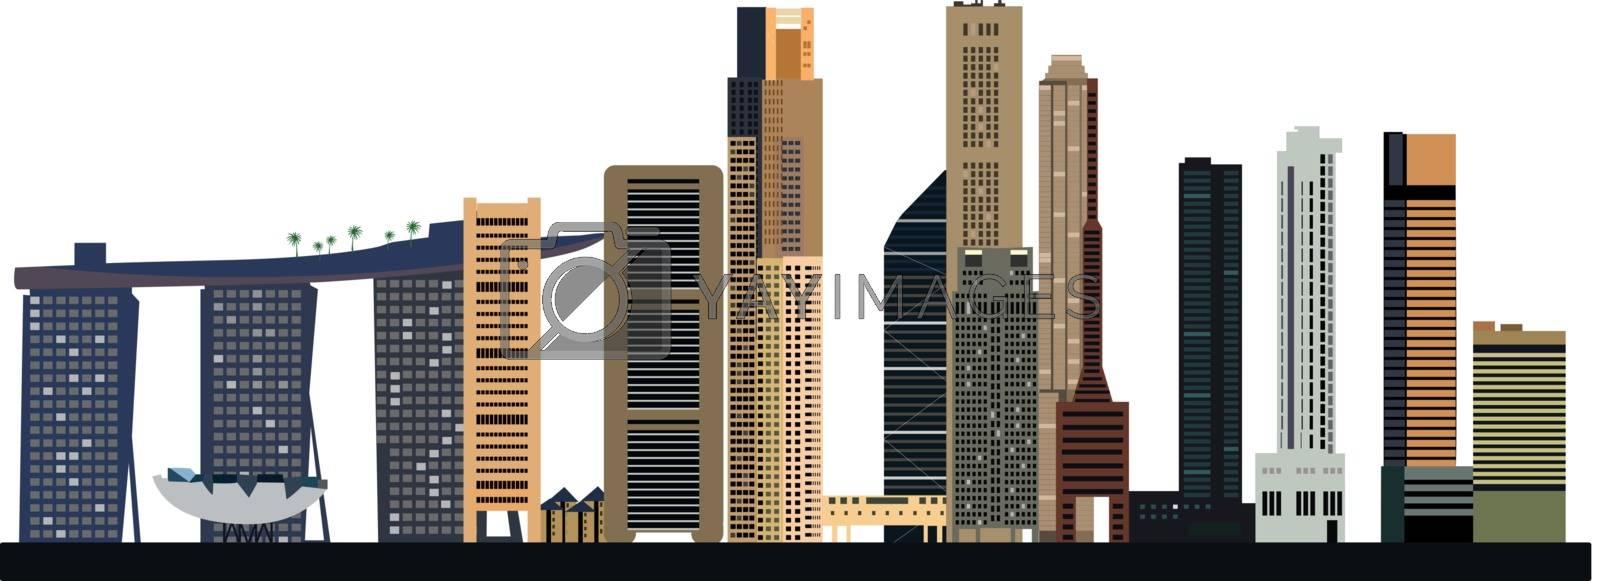 singapore city skyline by compuinfoto